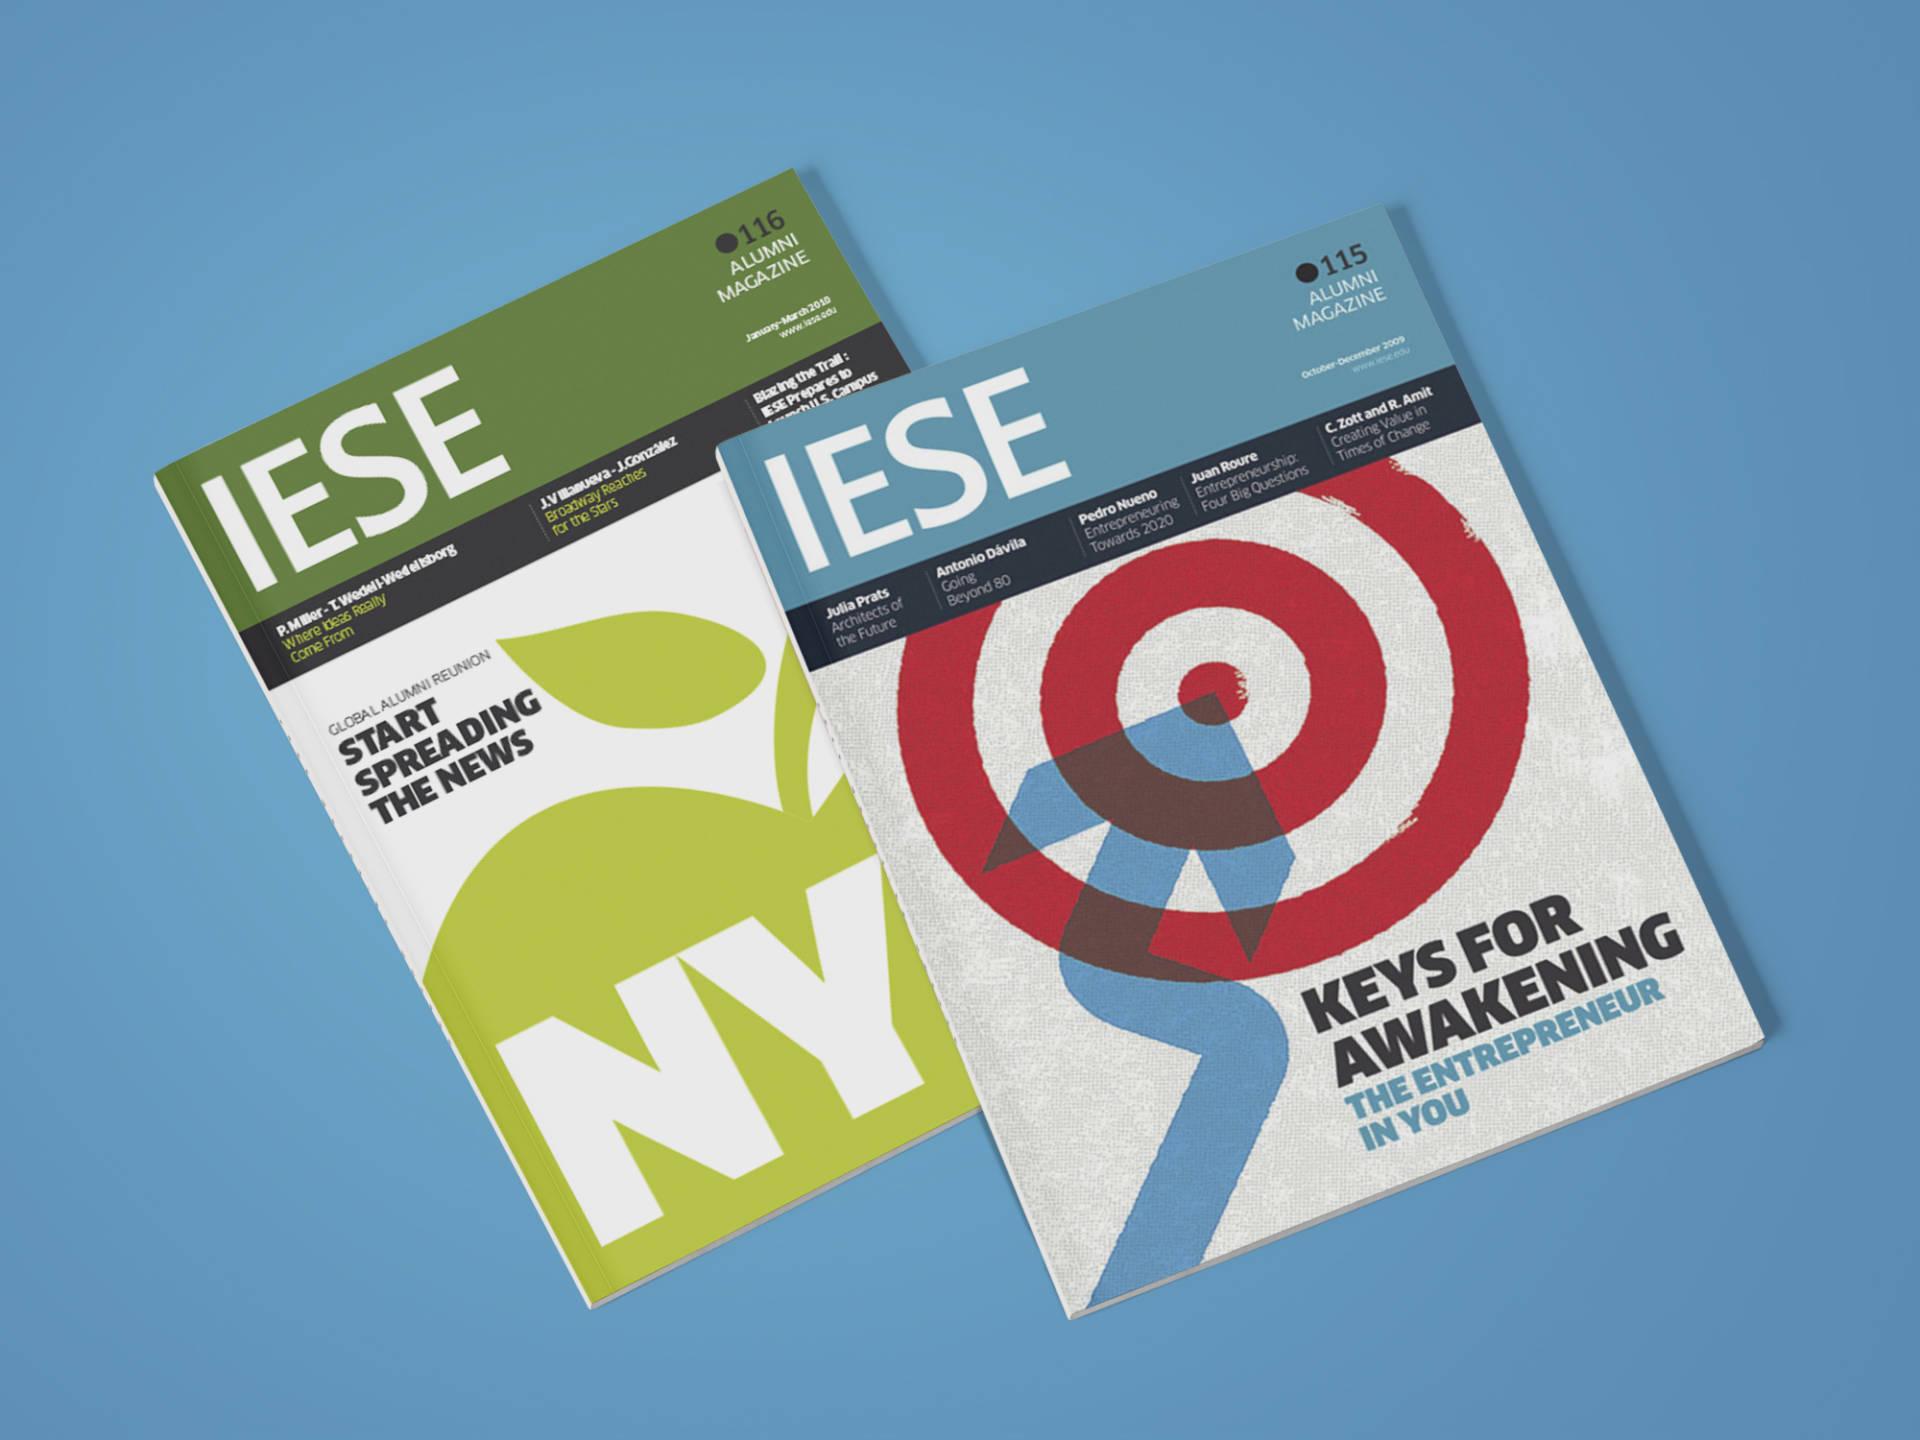 Iese_01B_Wenceslau_News_Design